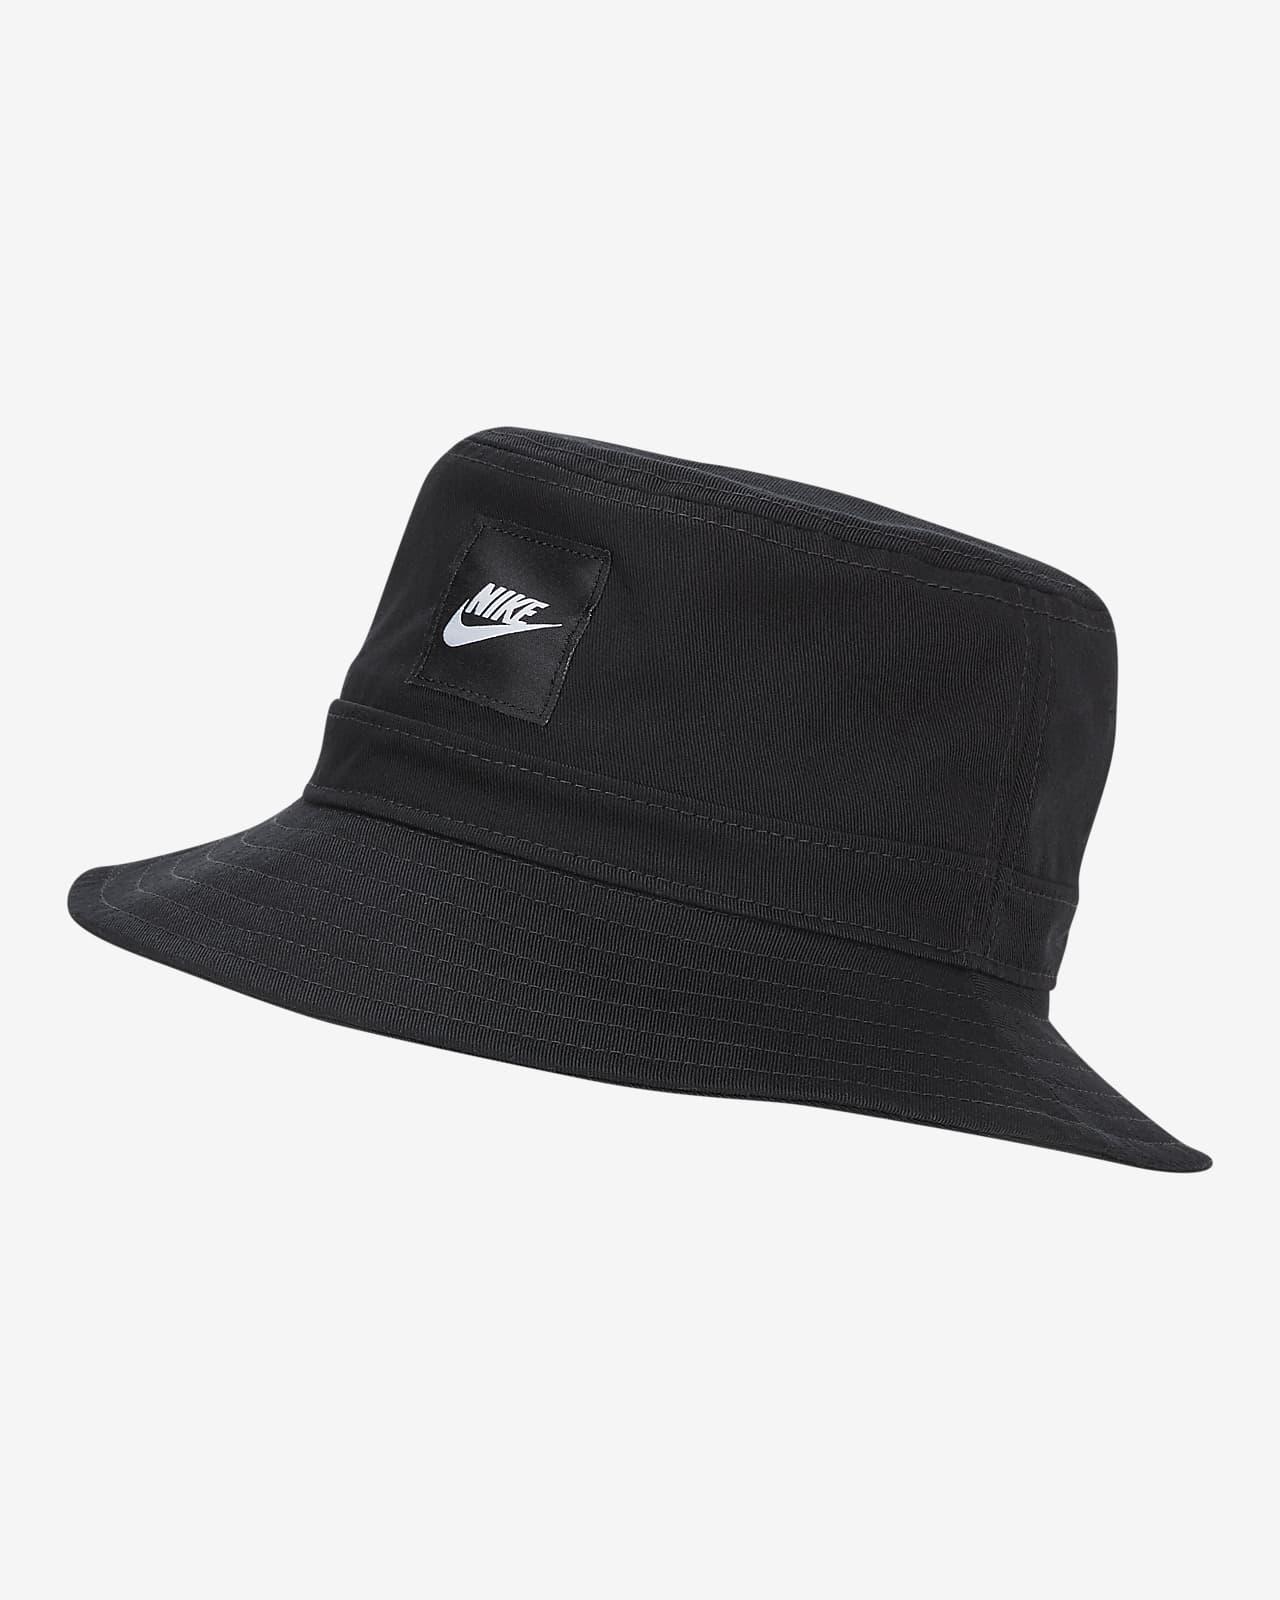 Cappello Nike - Bambini